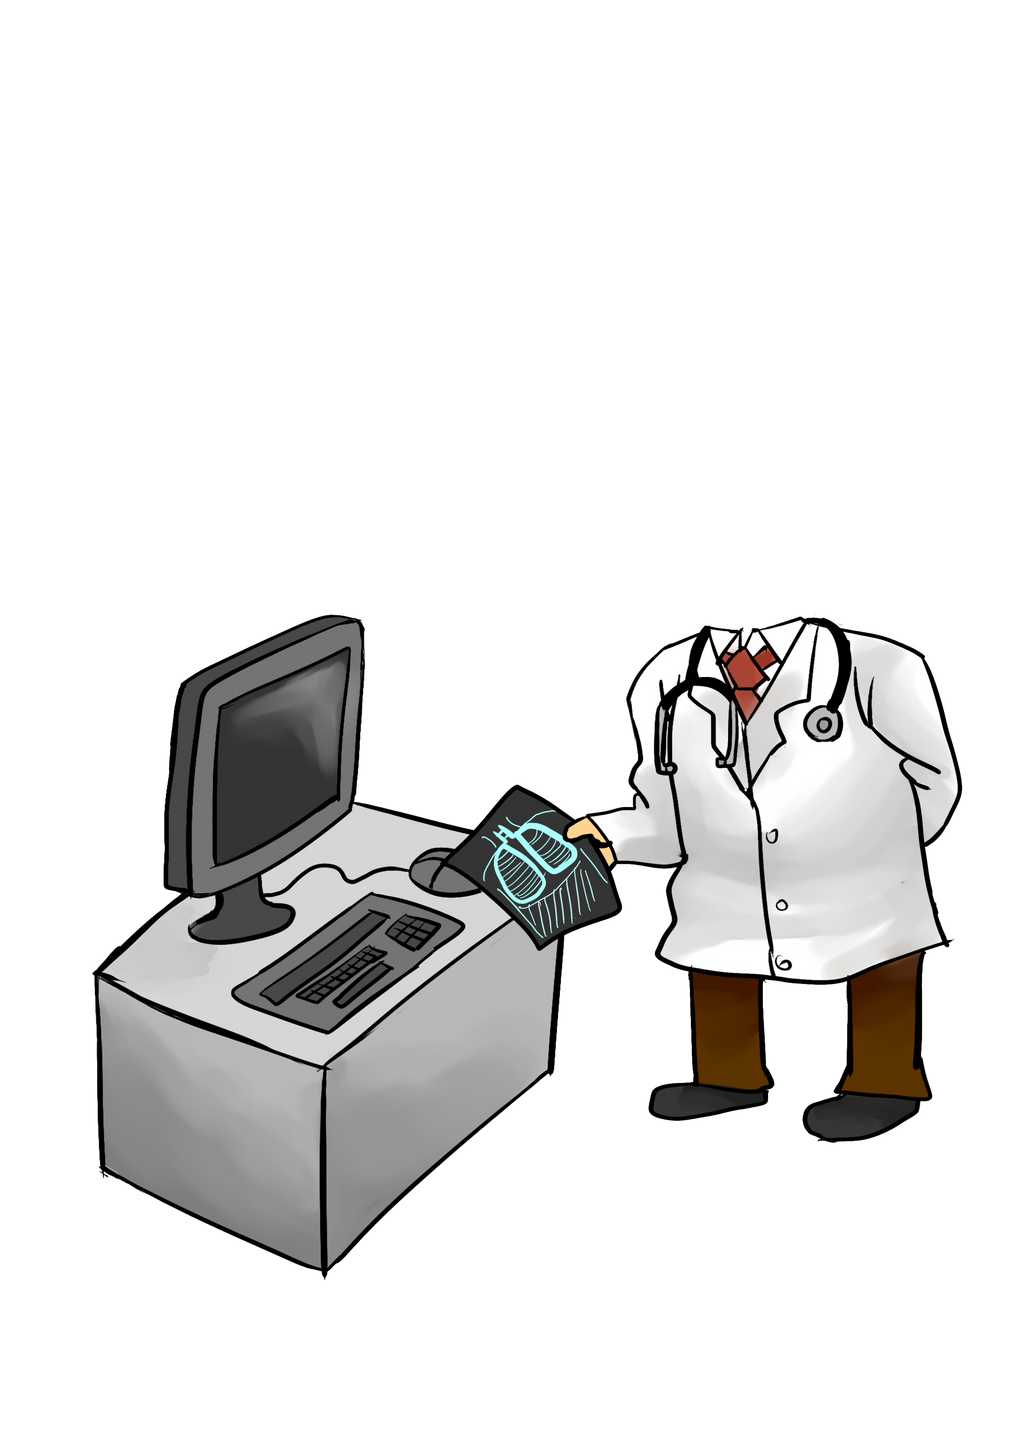 Radiology Technician by PotatoProject14